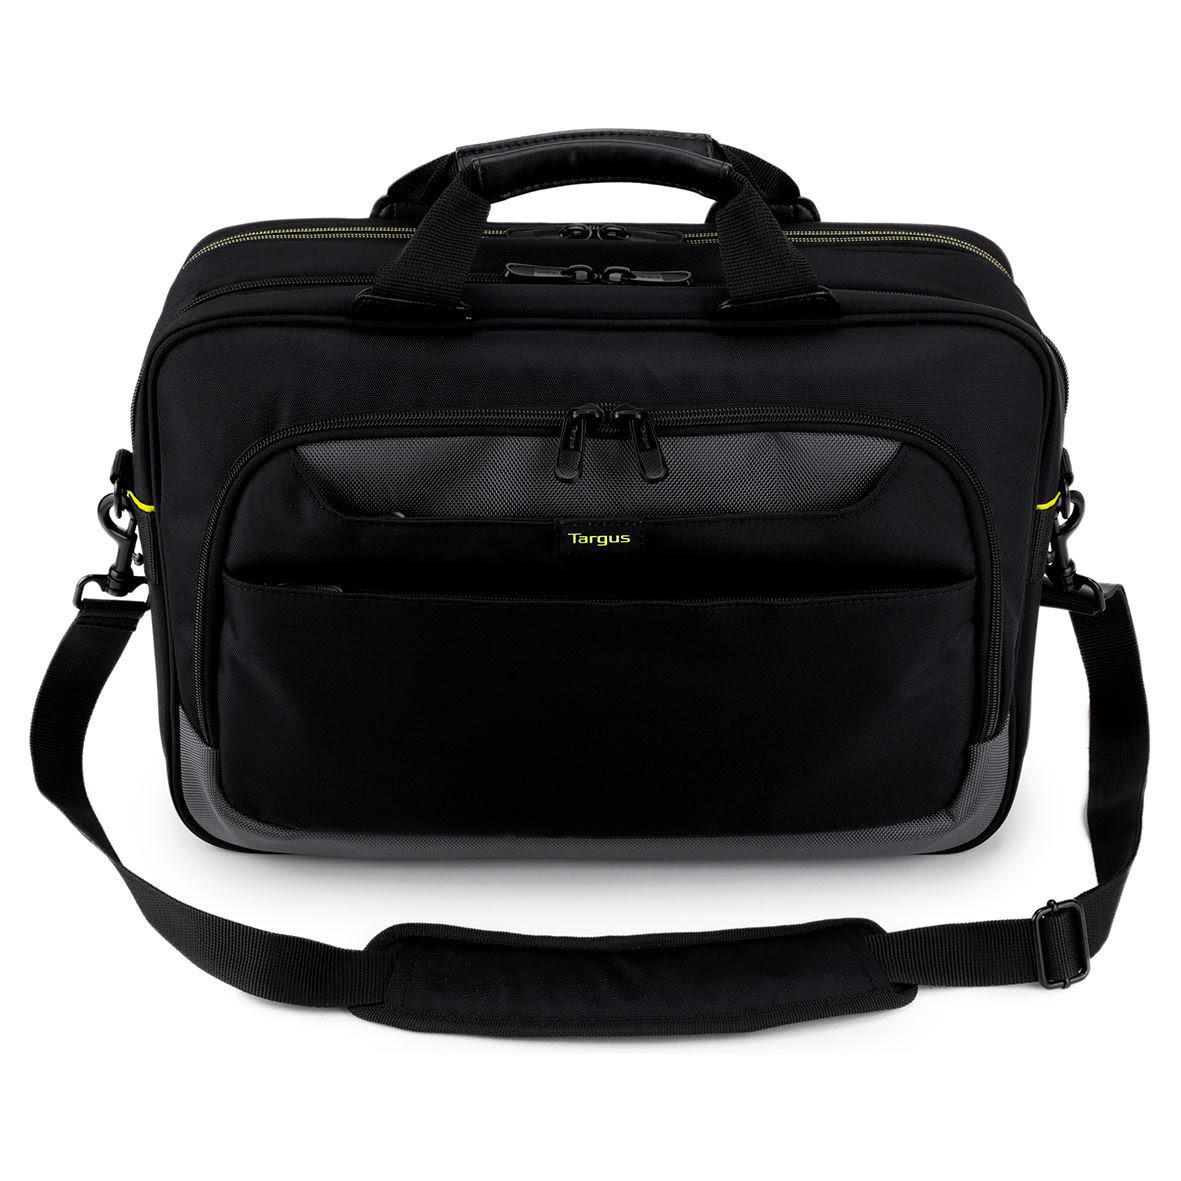 "TCG470EU CityGear 15-17.3"" Topload Laptop Case Targus - 4"